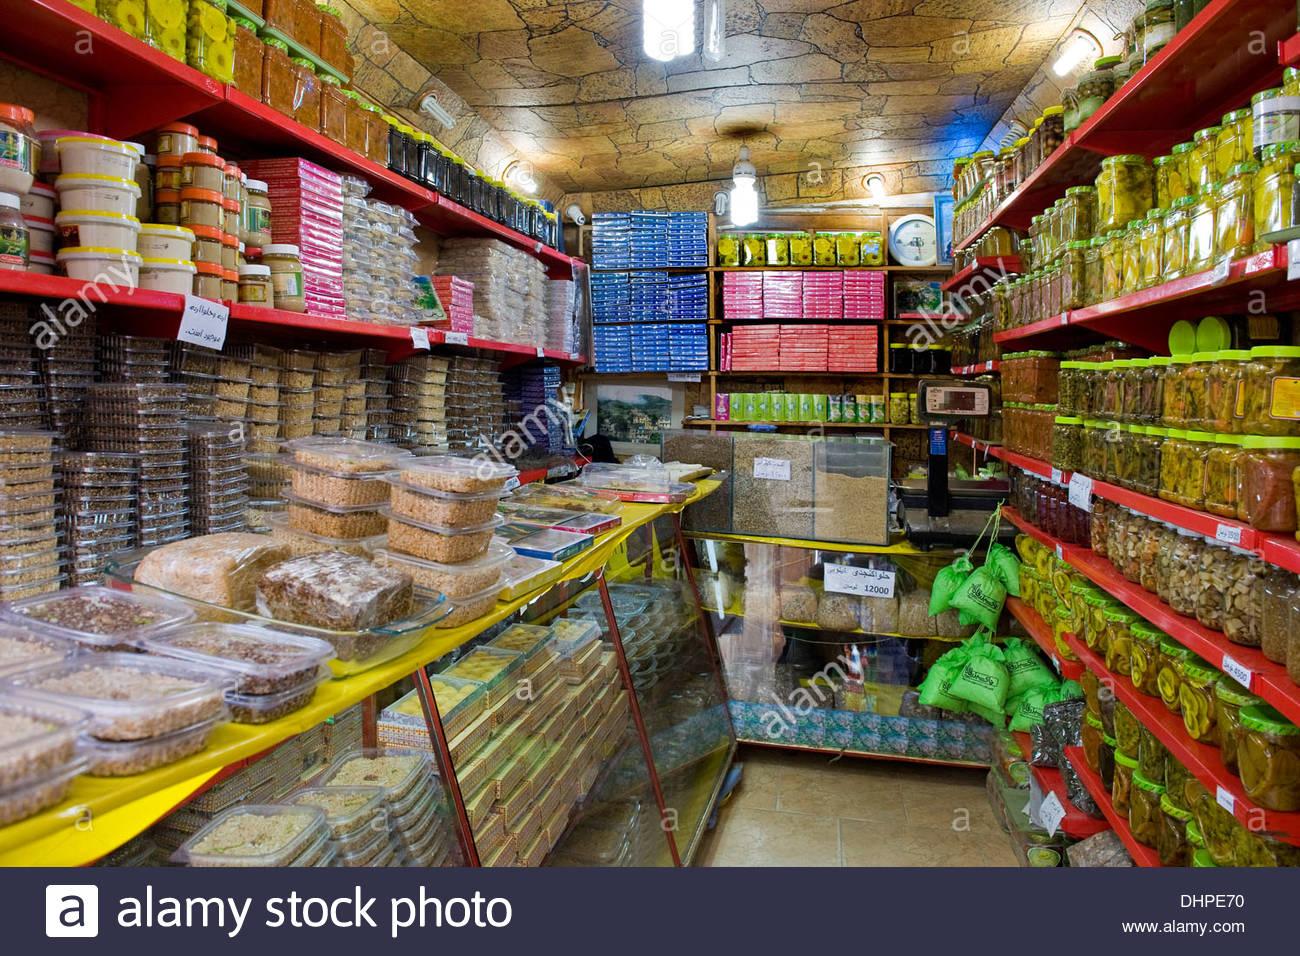 Iran,Azerbaijan region,Masuleh,shop Stock Photo